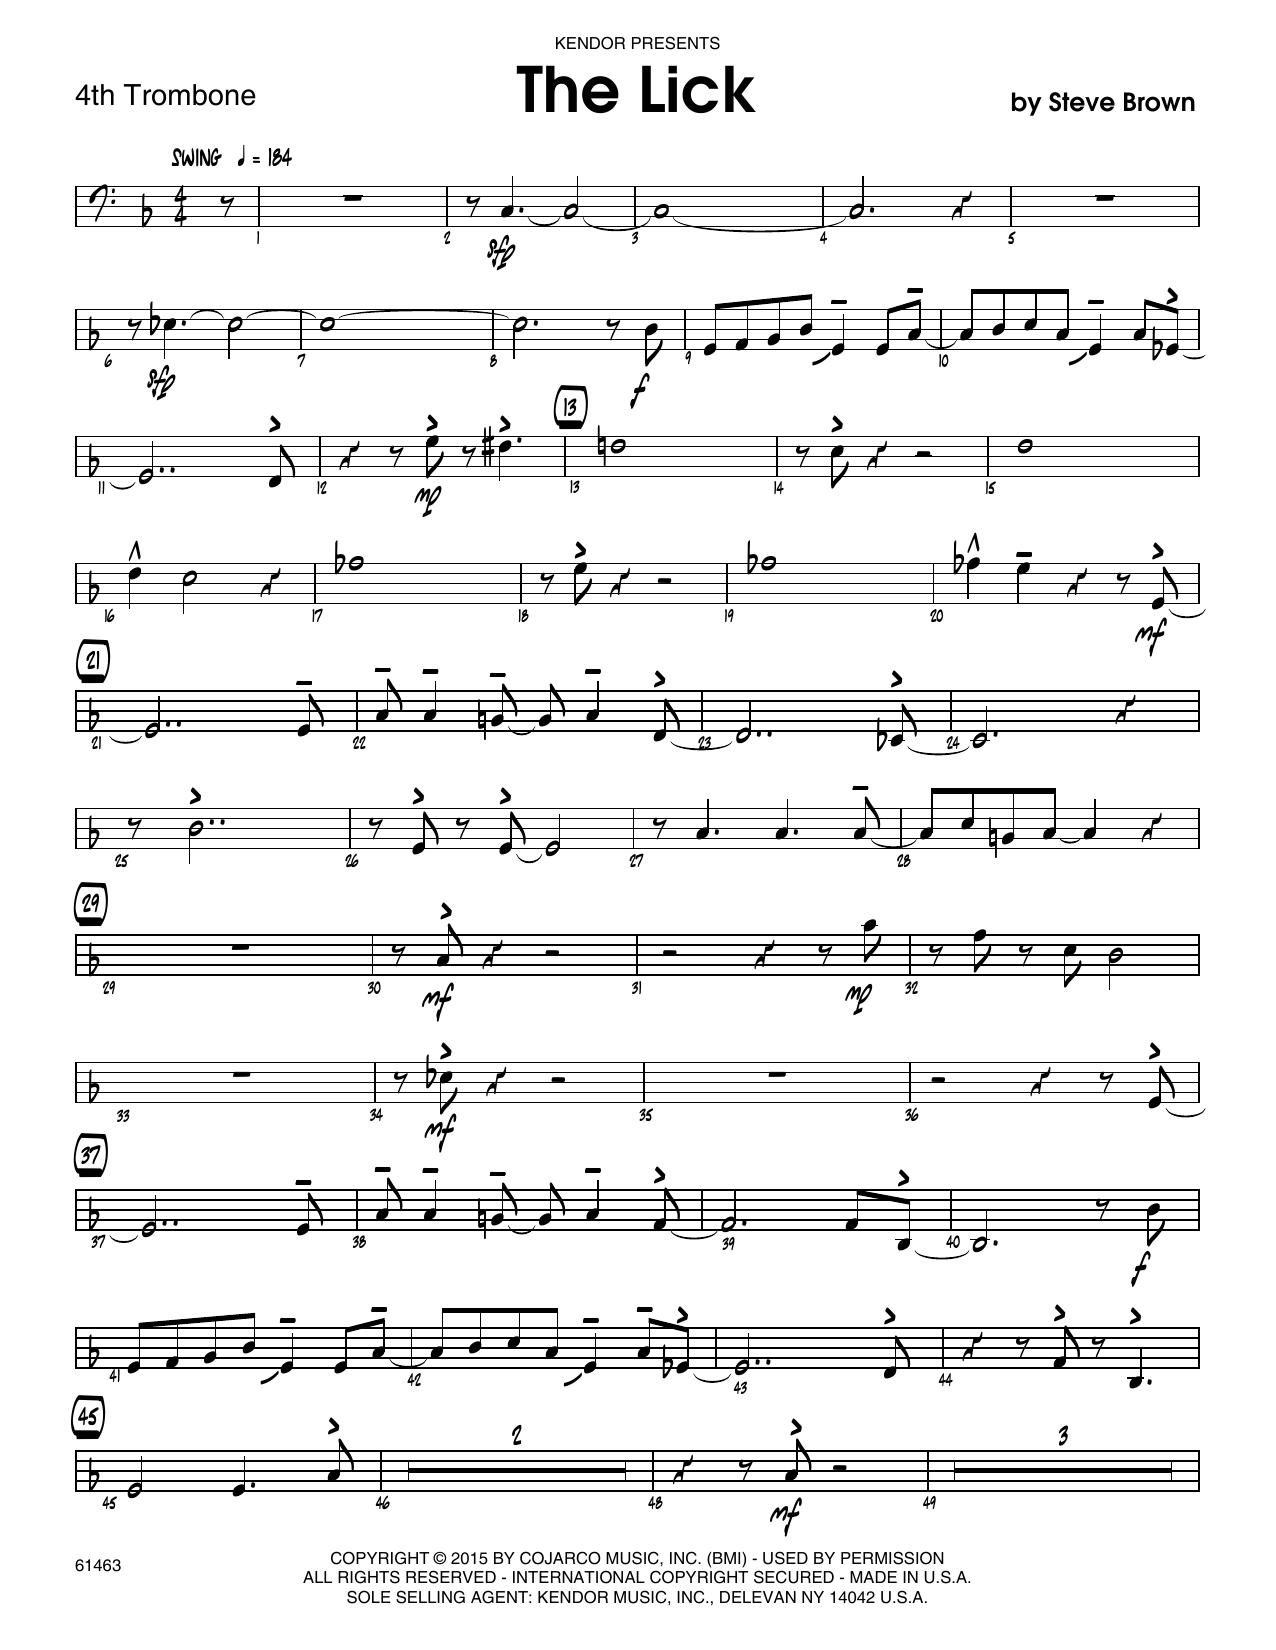 The Lick - 3rd Trombone